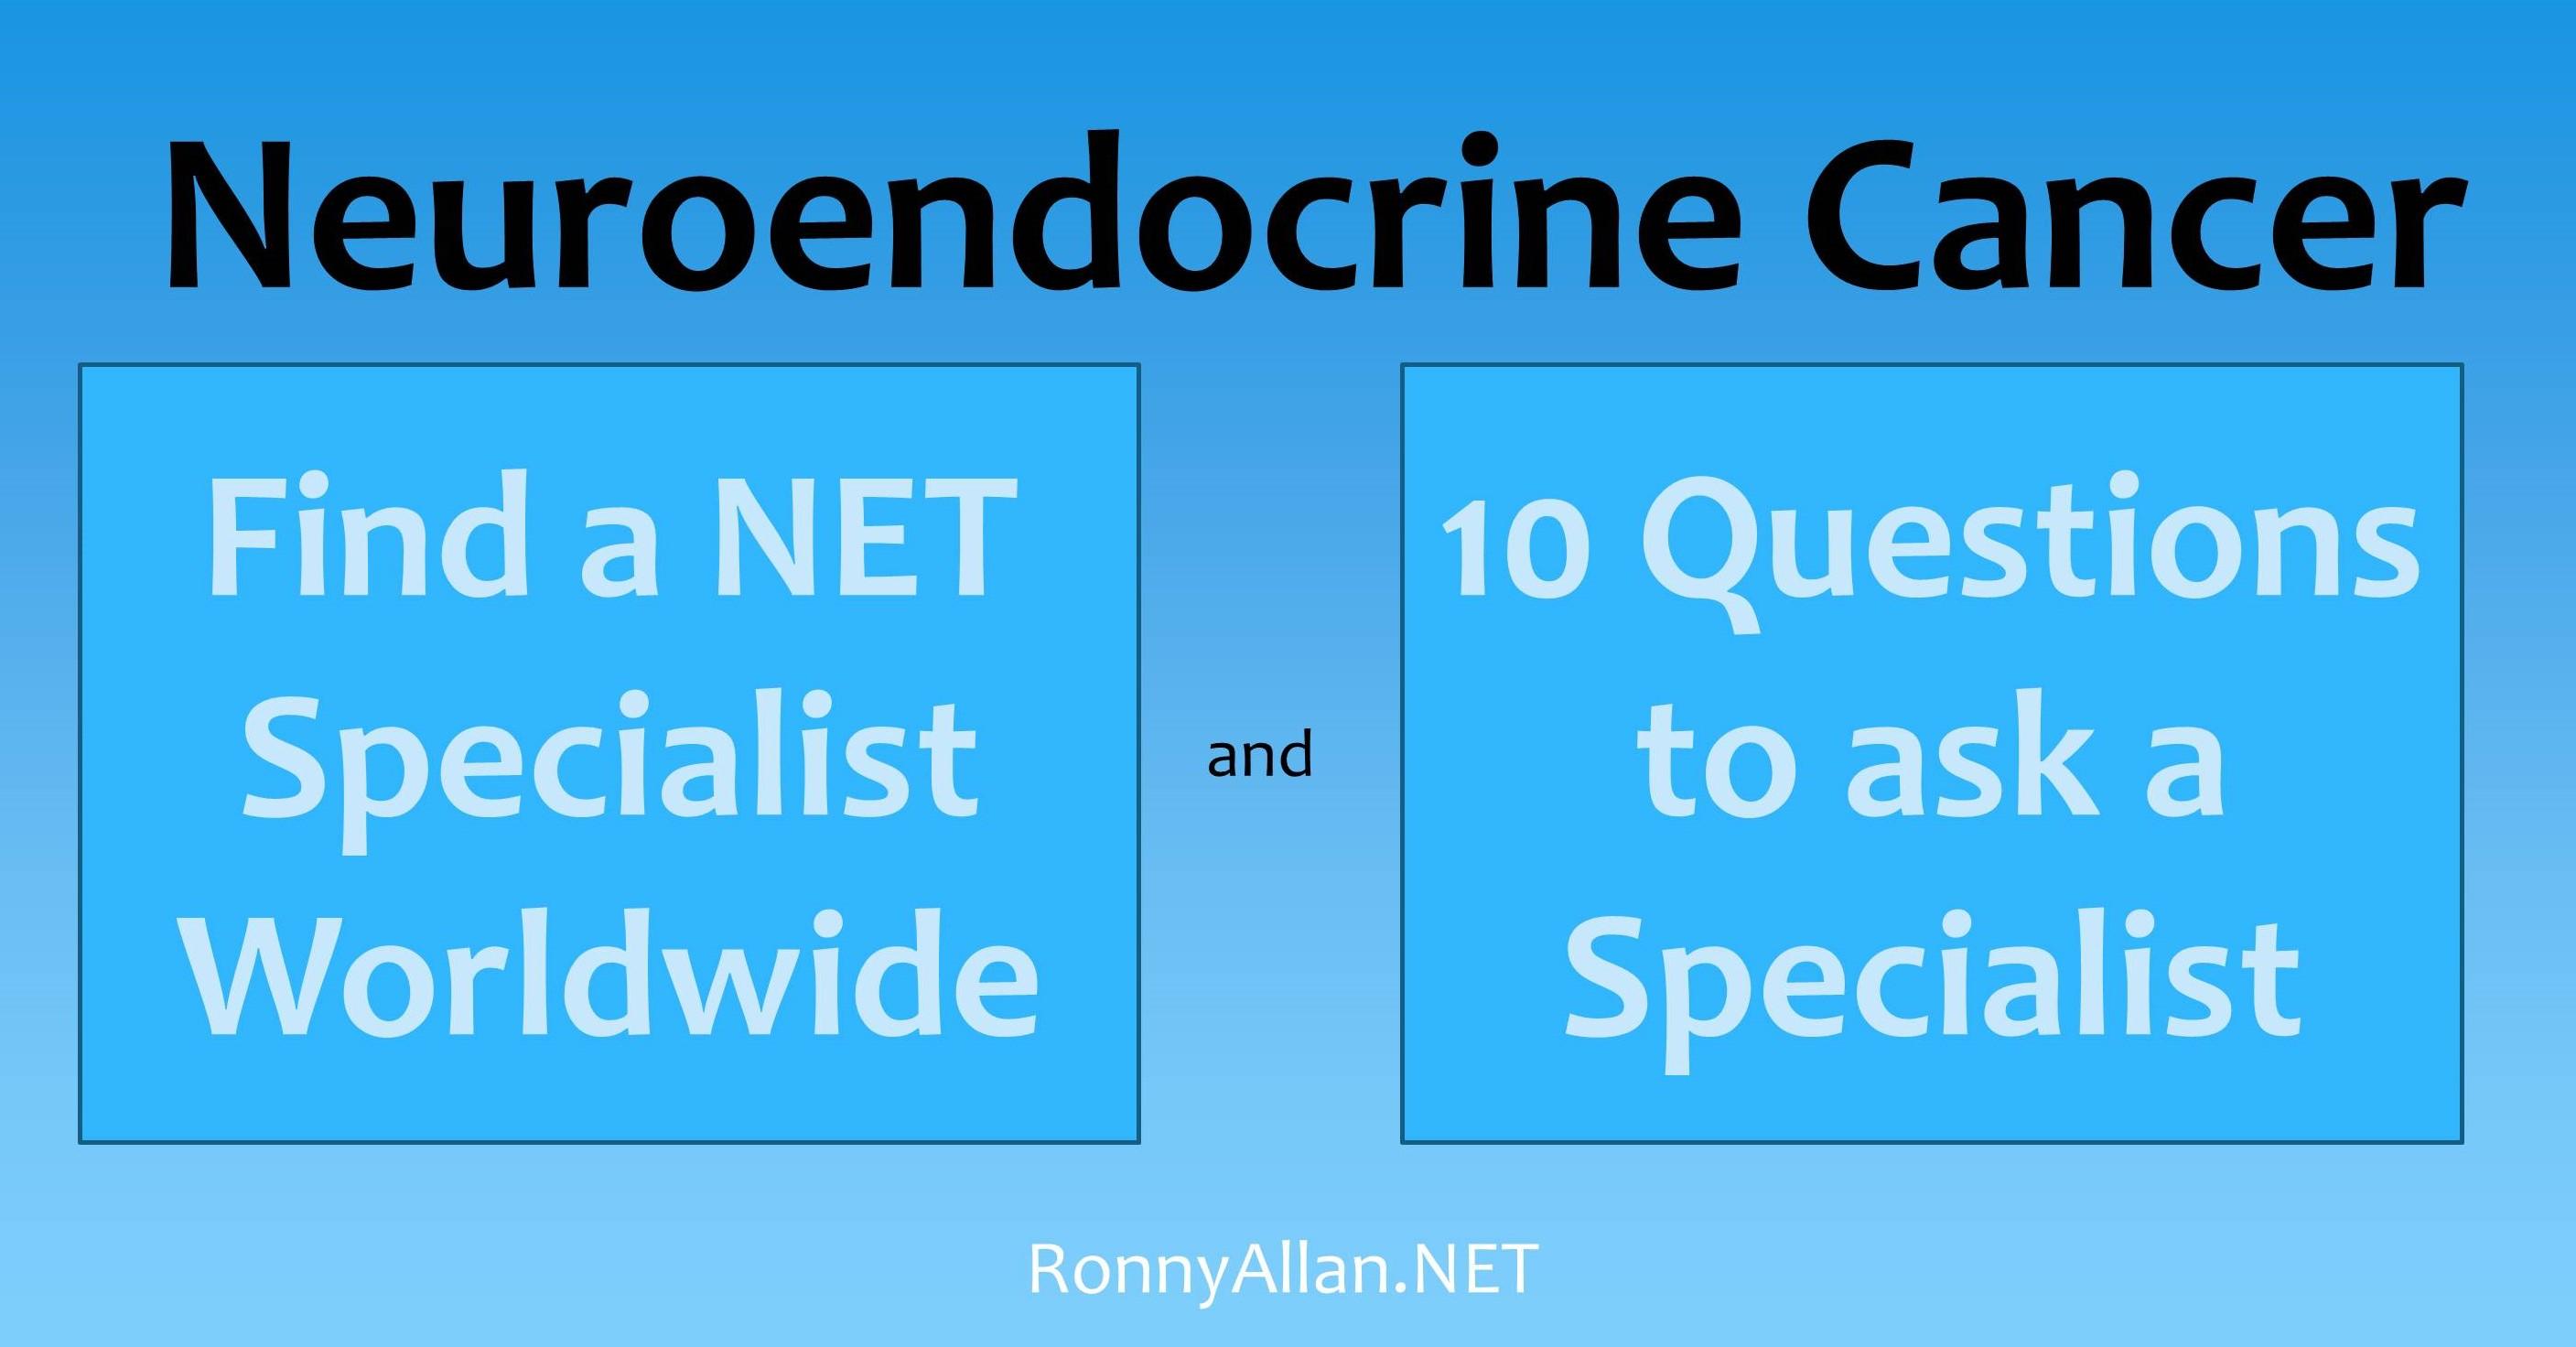 Neuroendocrine cancer remission, Este cel mai eficient medicament pentru nematode